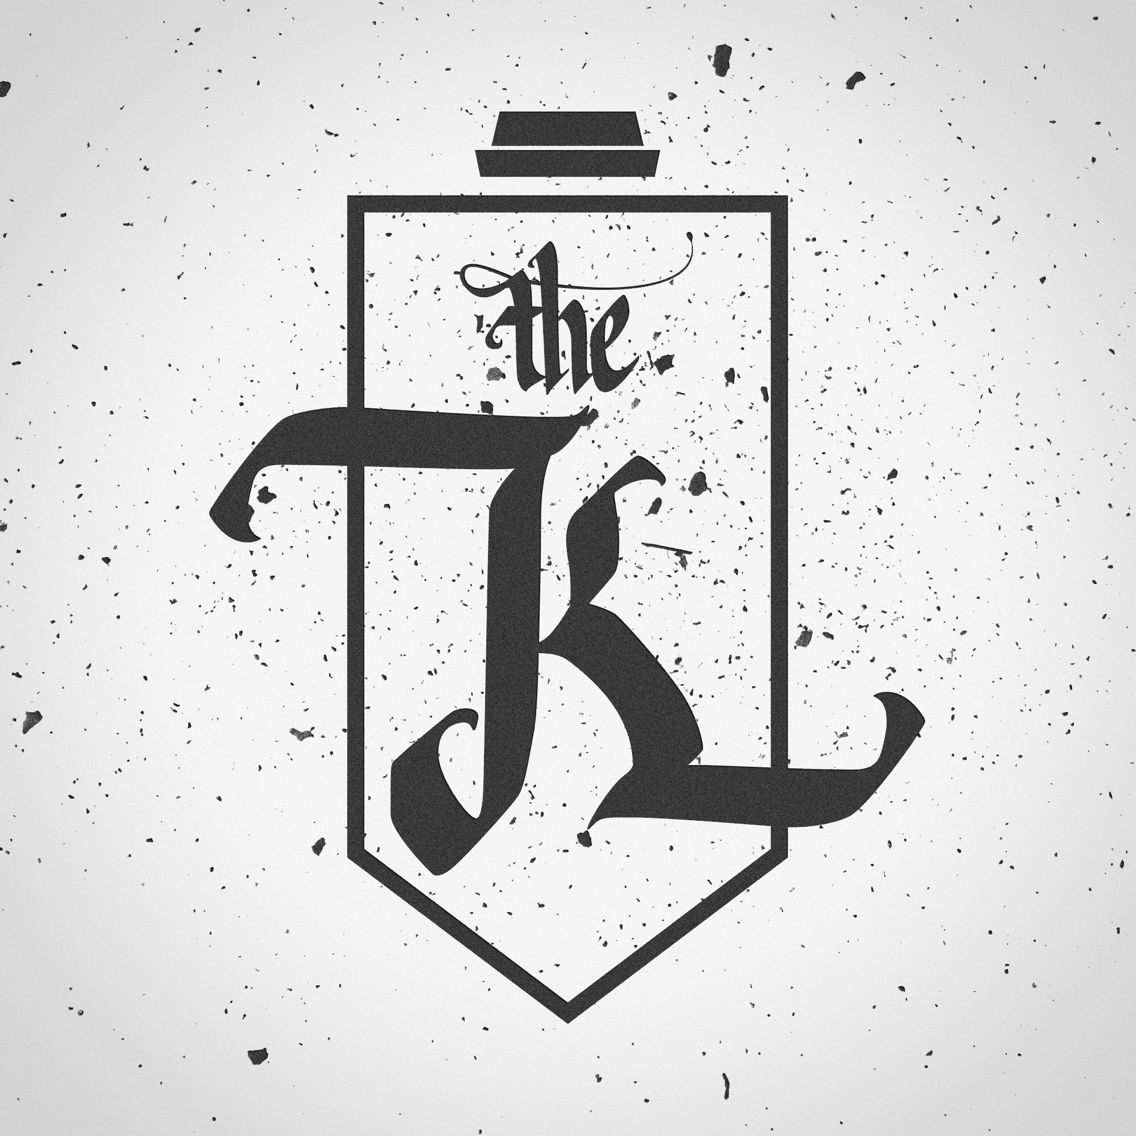 THE K - Streetdancing. Branding | #kampen #illustration #graficdesign #wacom #cintiq #art #digital #painting #album #artwork #drawing #logo #corporate #design #brand #street #dancing